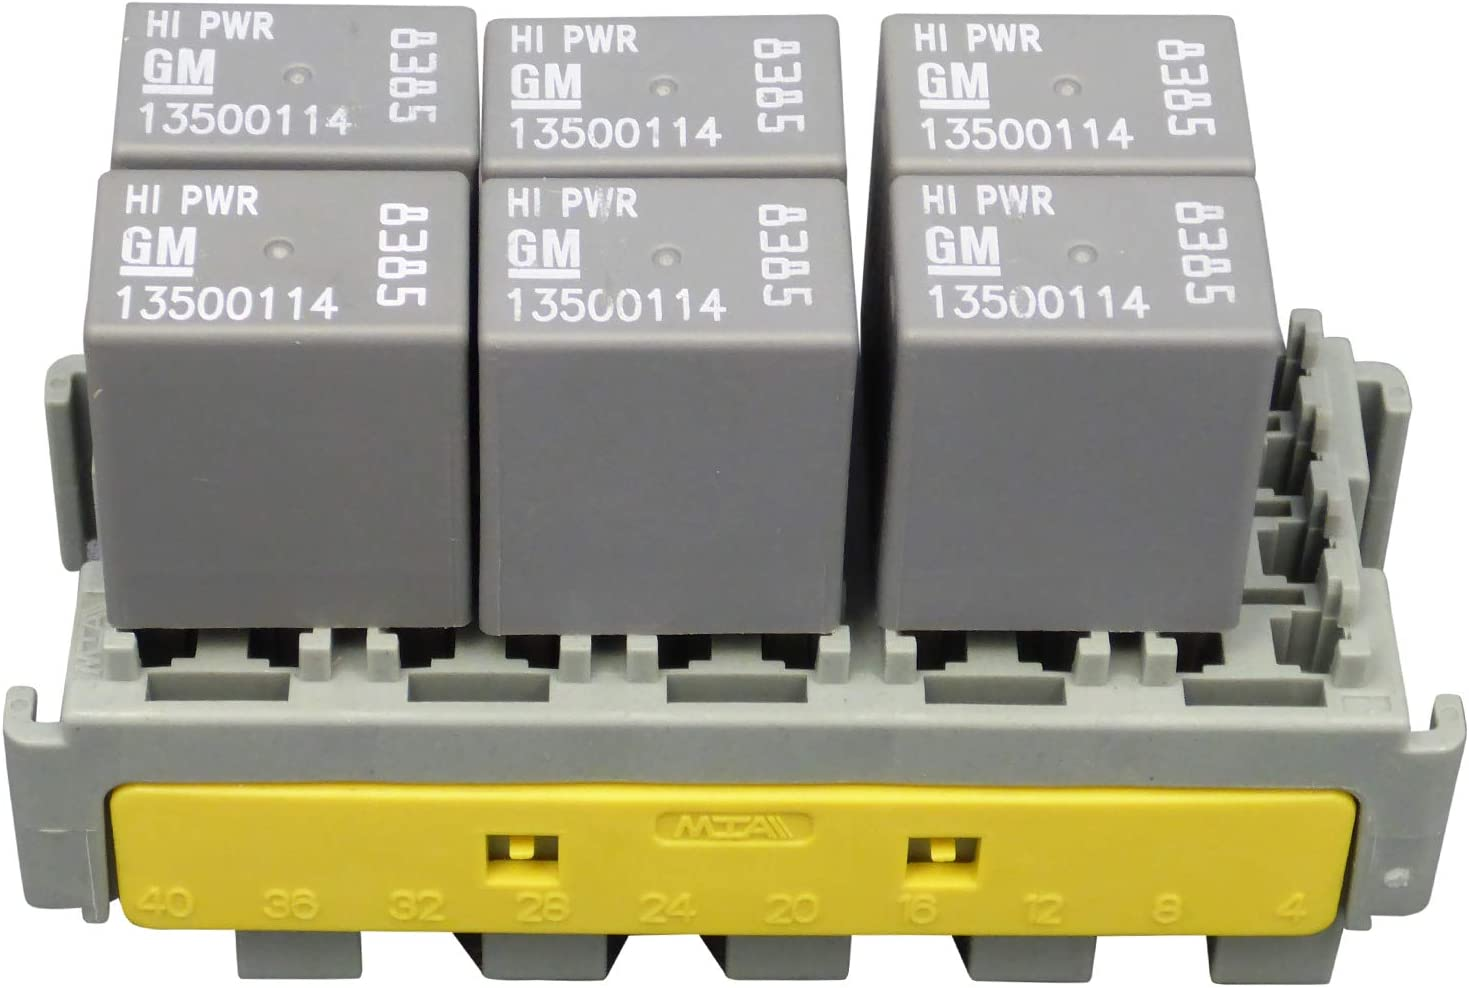 36V Akozon 30A Automatisches Ladeger/ät Ladeger/ät Controller Modul YX-1708 Exzessive Sch/ützen Bord 12V//24V//36V//48V